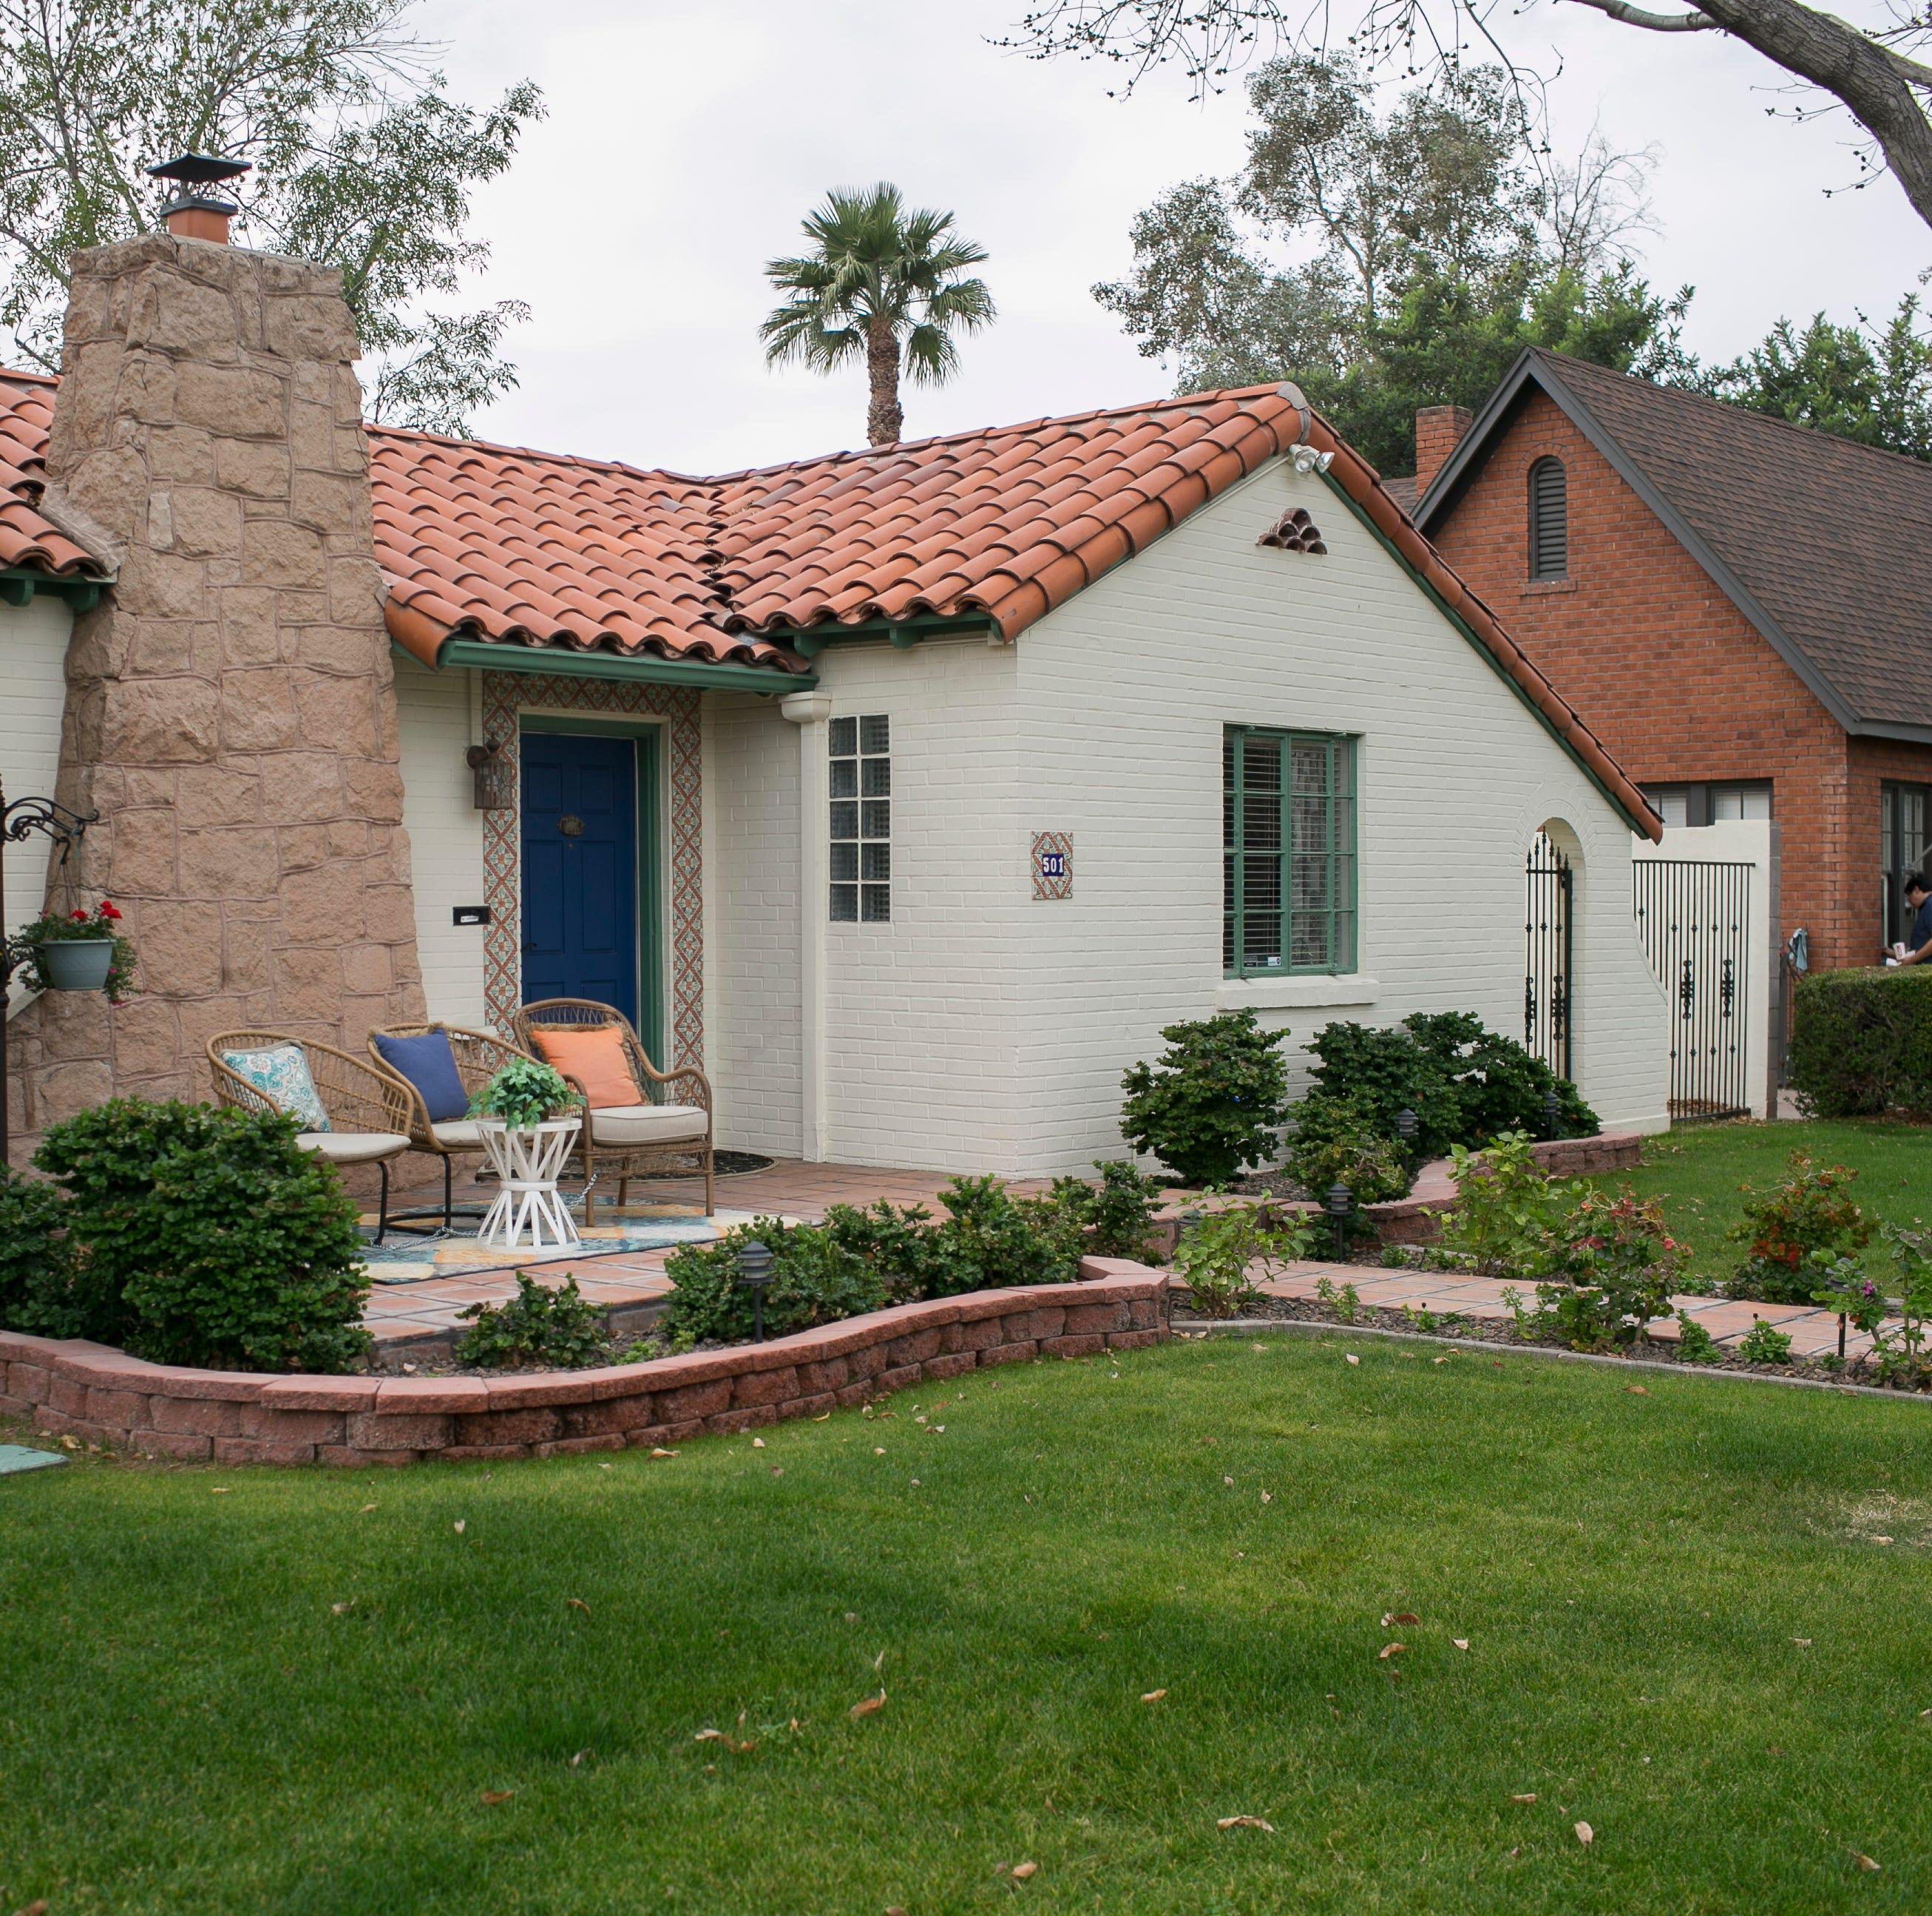 Better times for buyers in metro Phoenix housing market